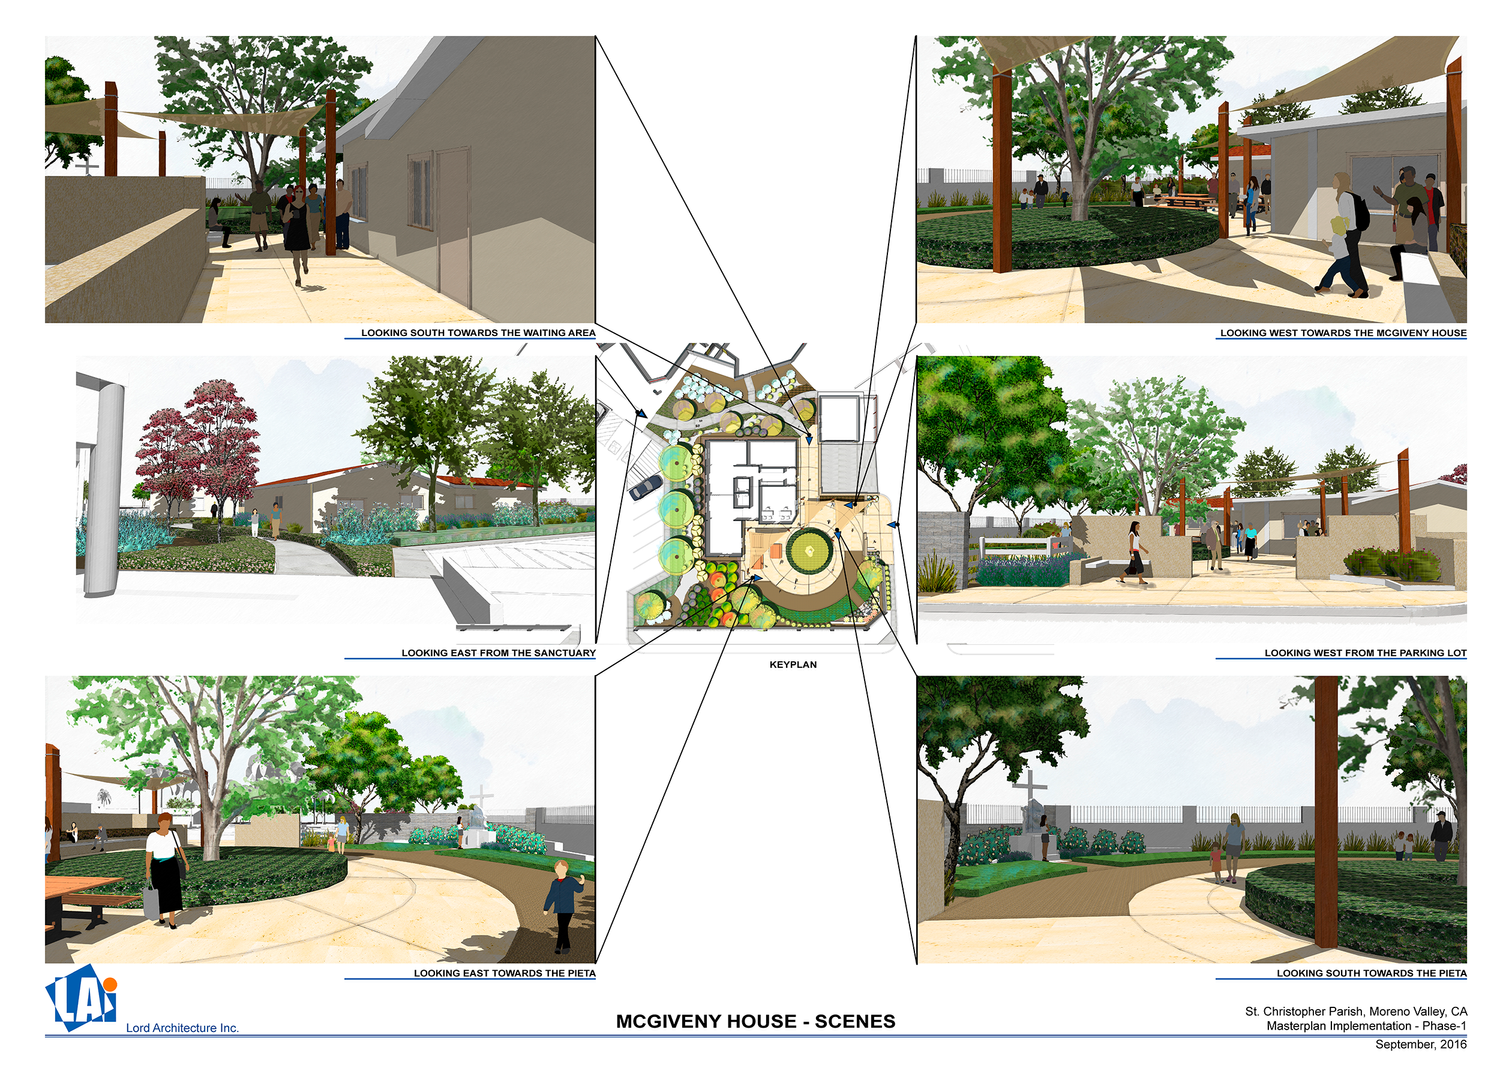 McGivney House Renovation  -Concept Drawing 1